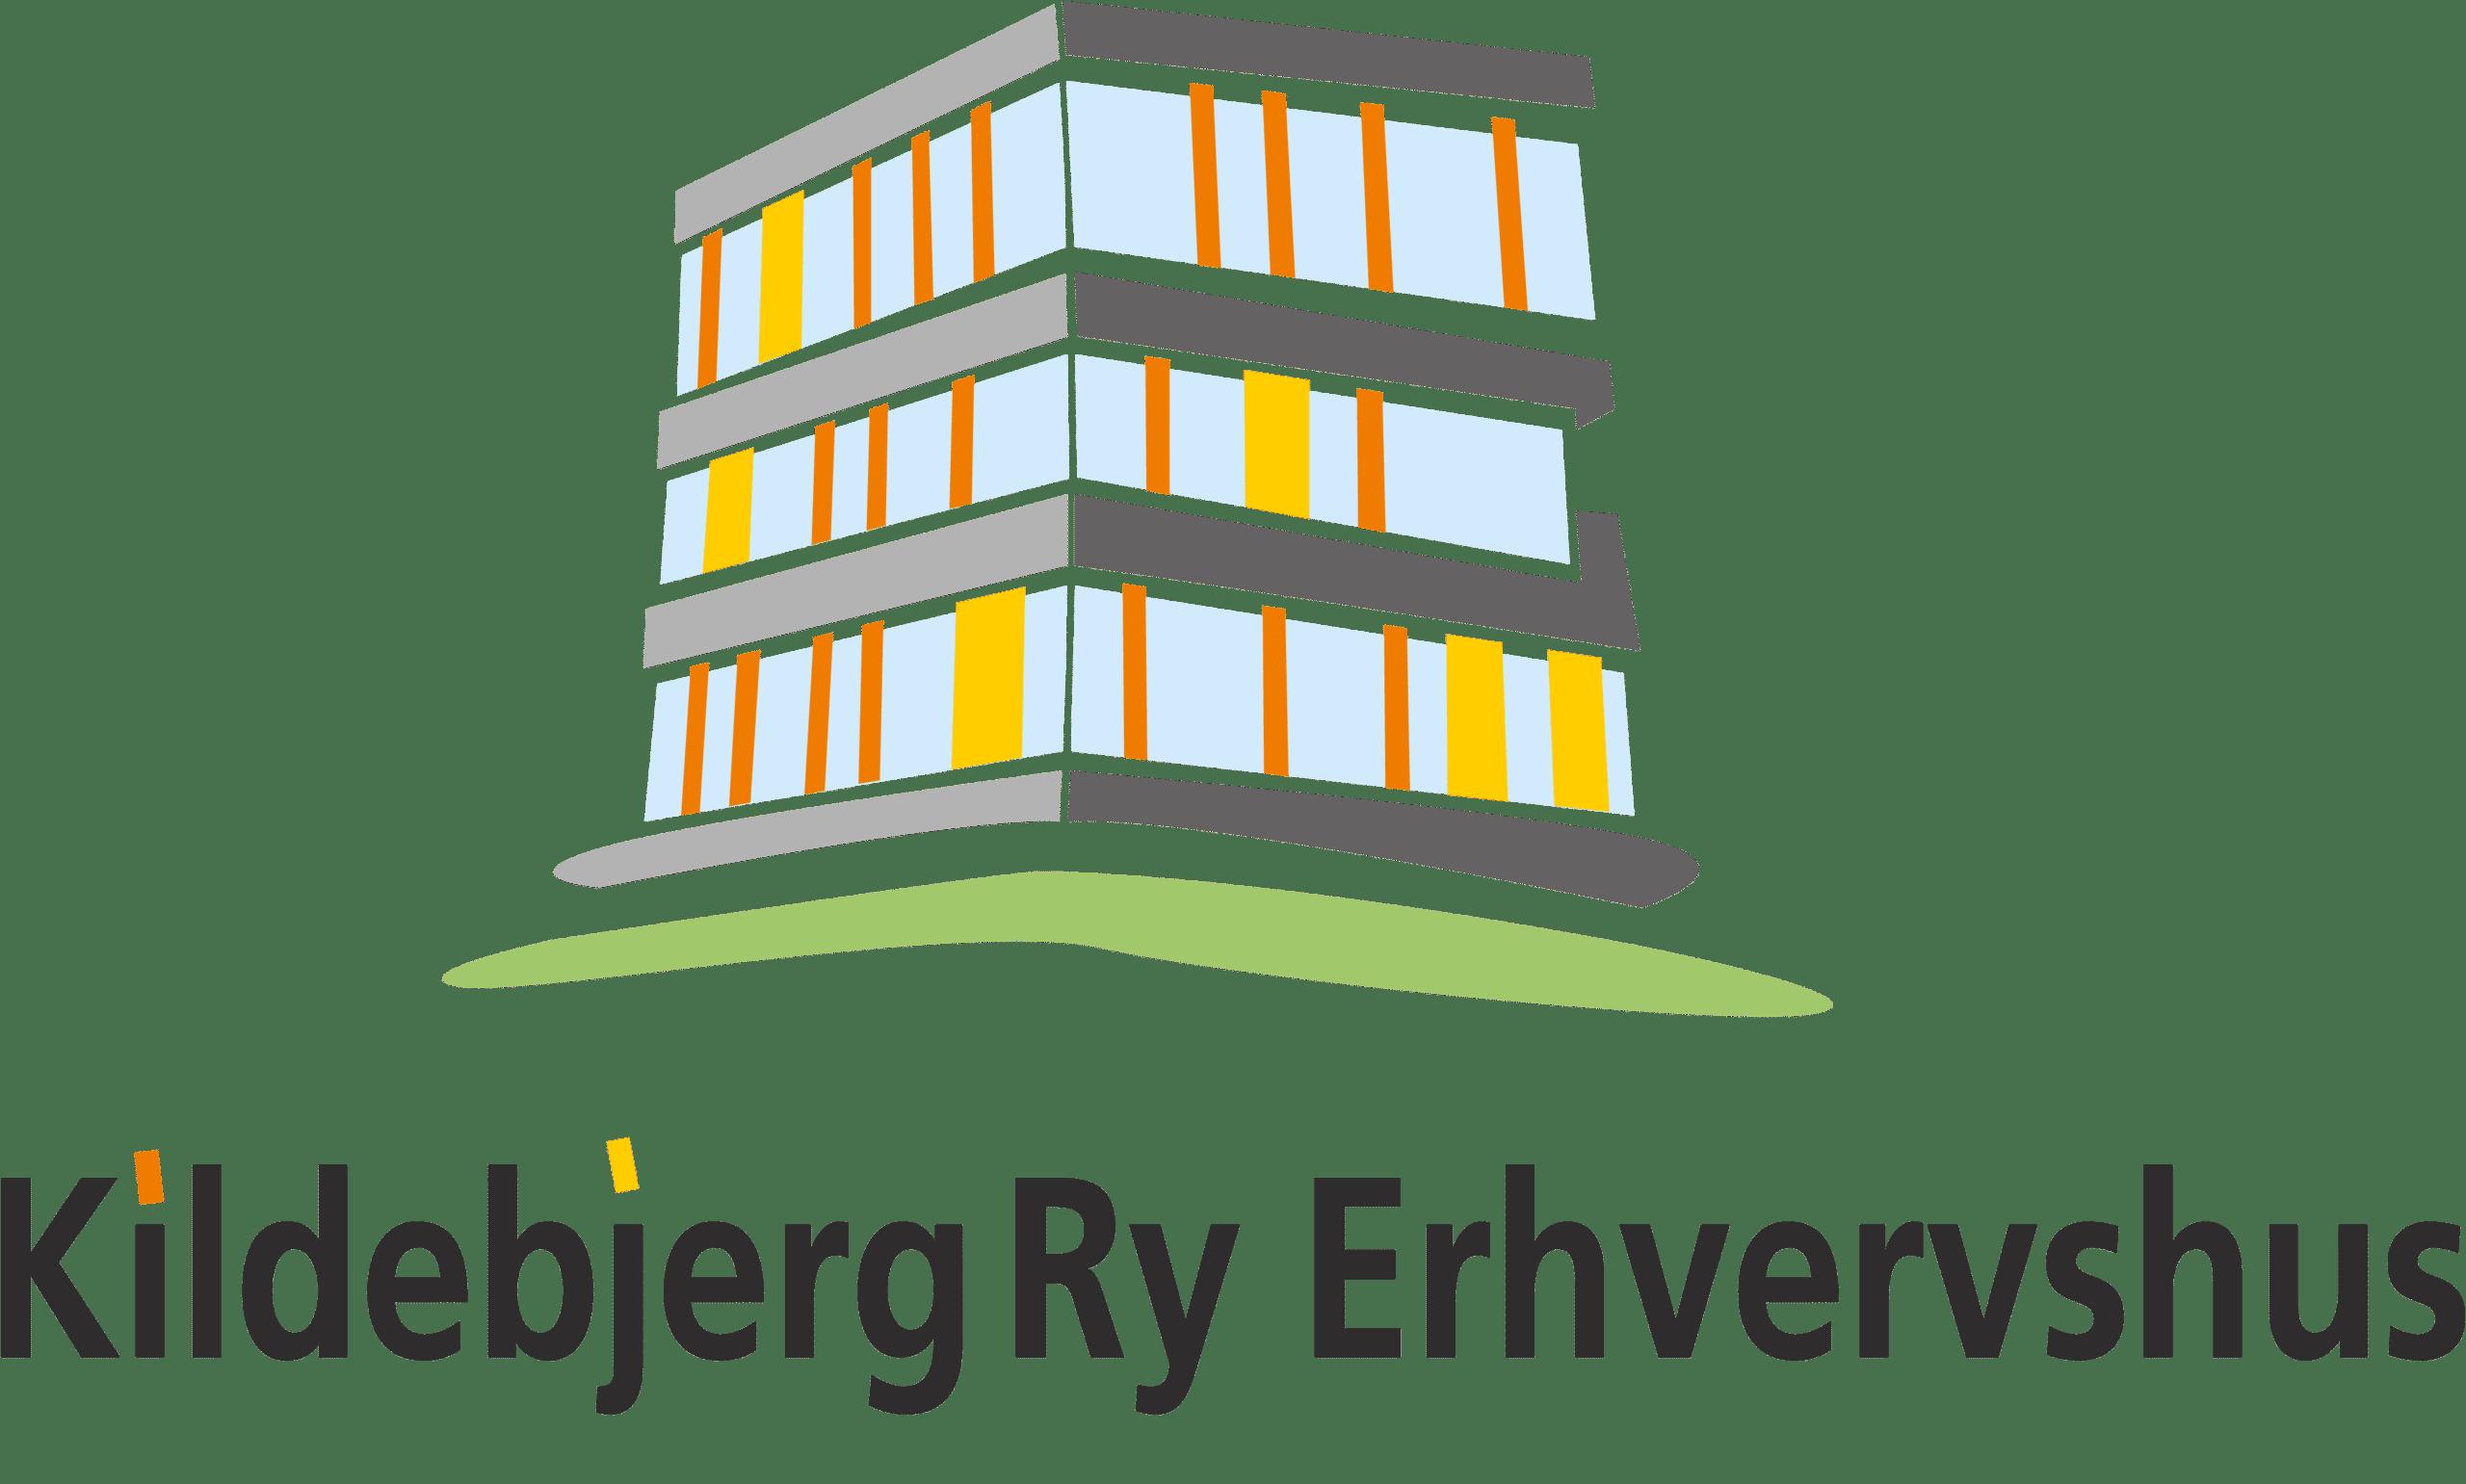 Kildebjerg Ry Erhvervshus